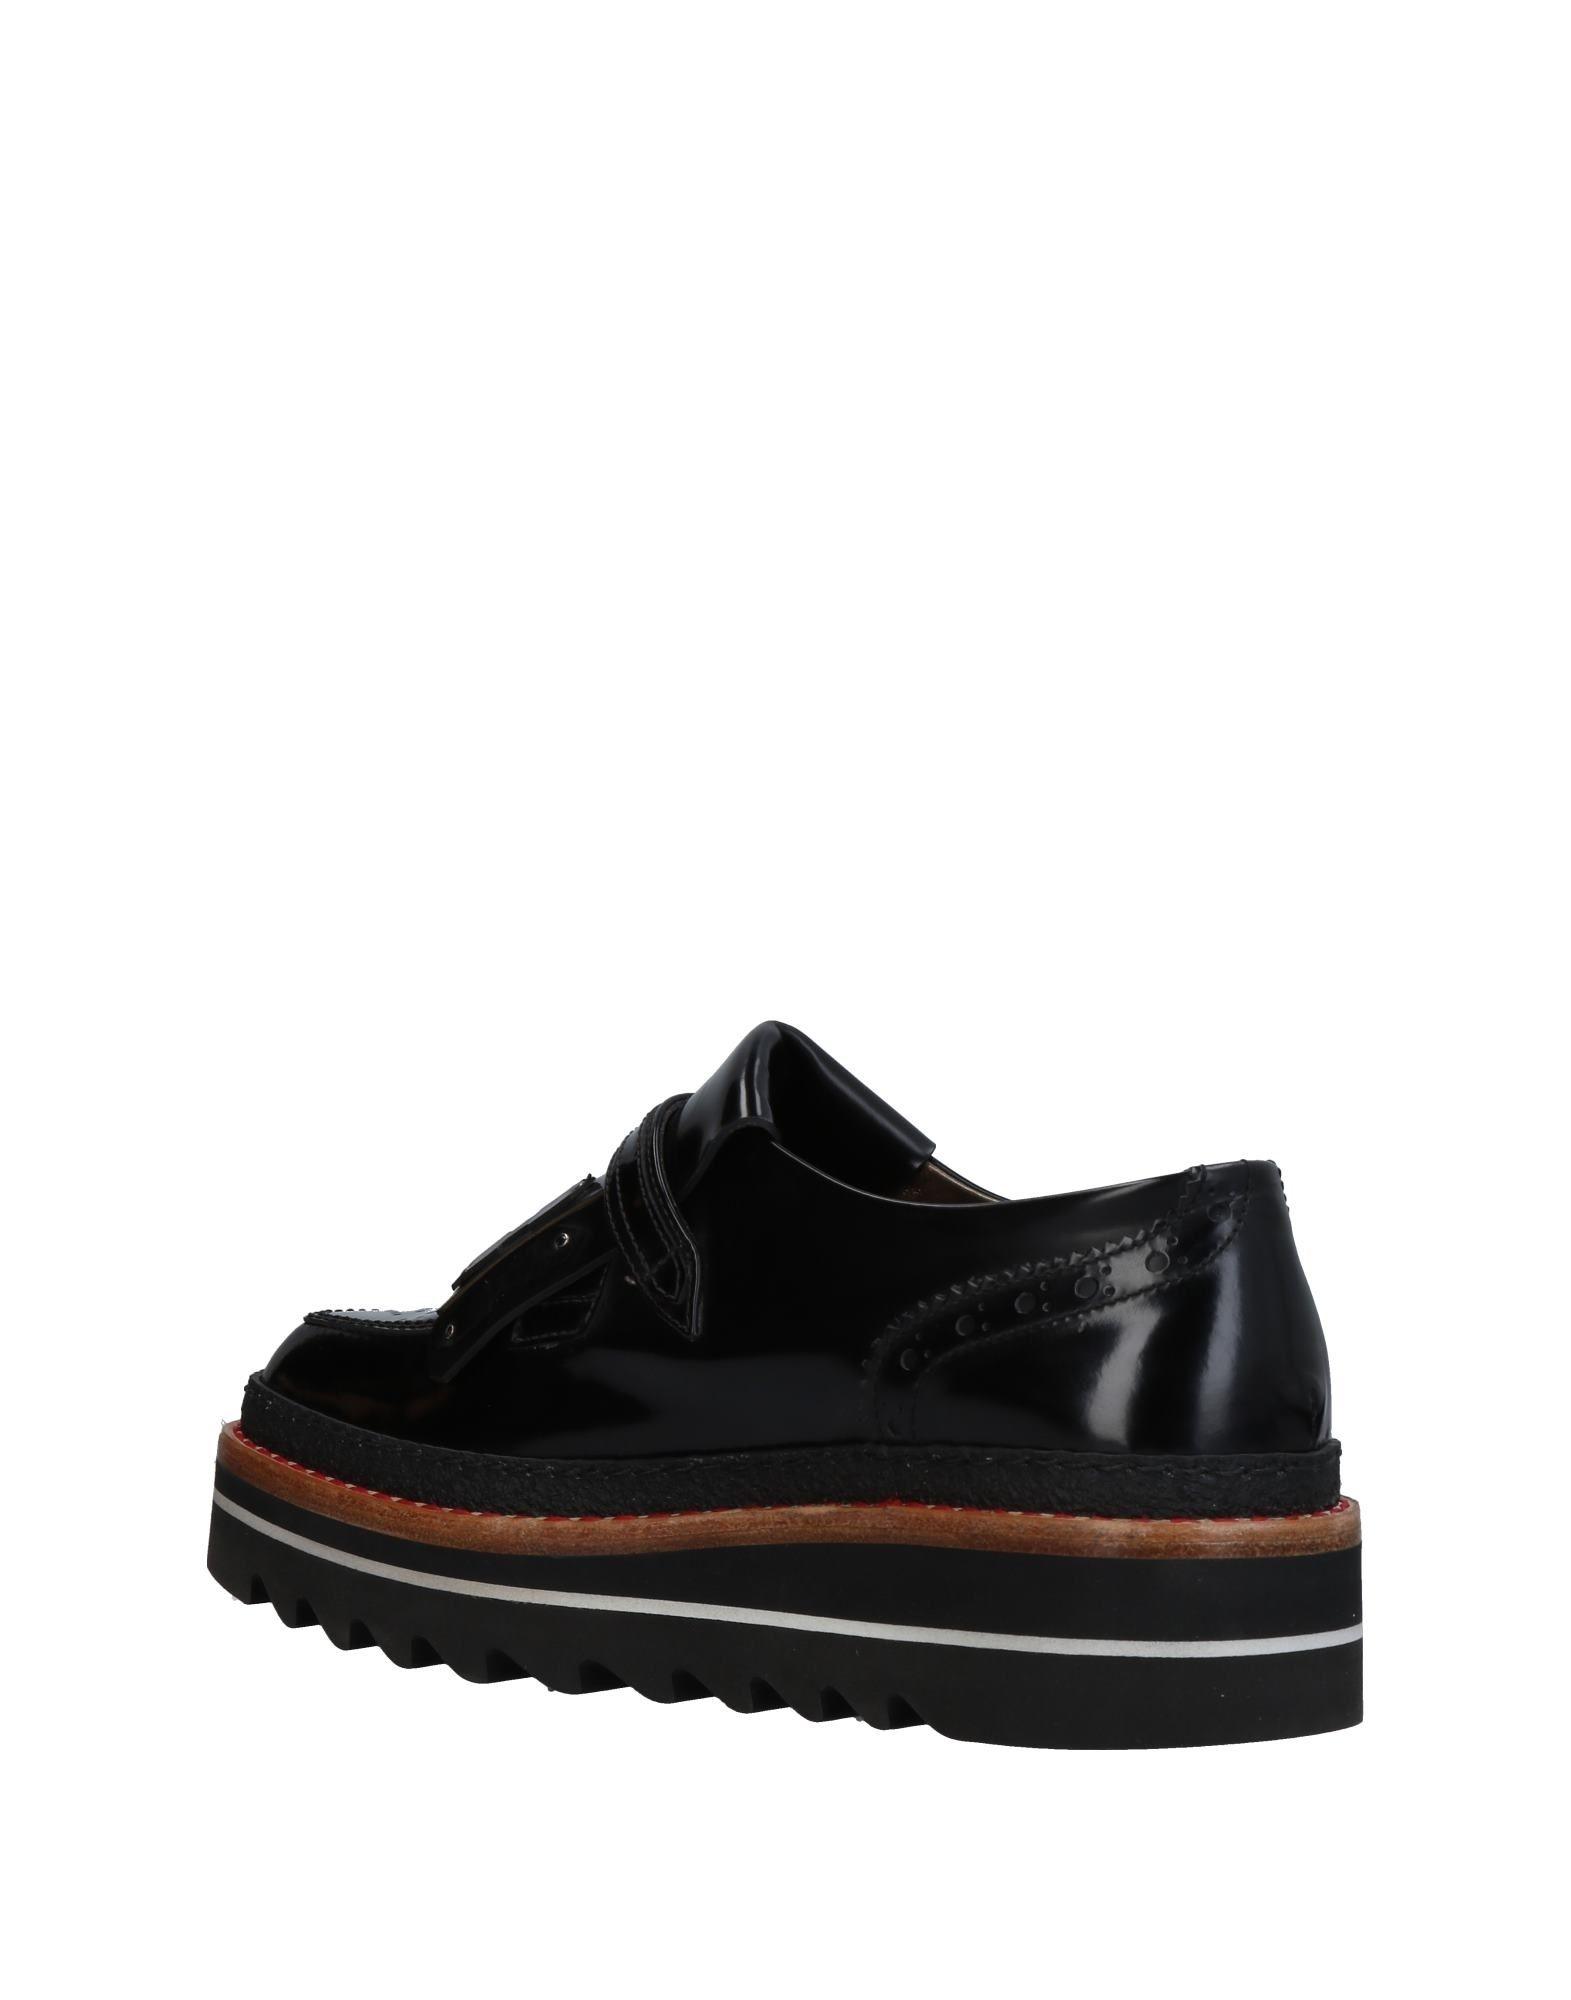 Stilvolle billige  Schuhe Barracuda Mokassins Damen  billige 11460036MH 0ac9ec